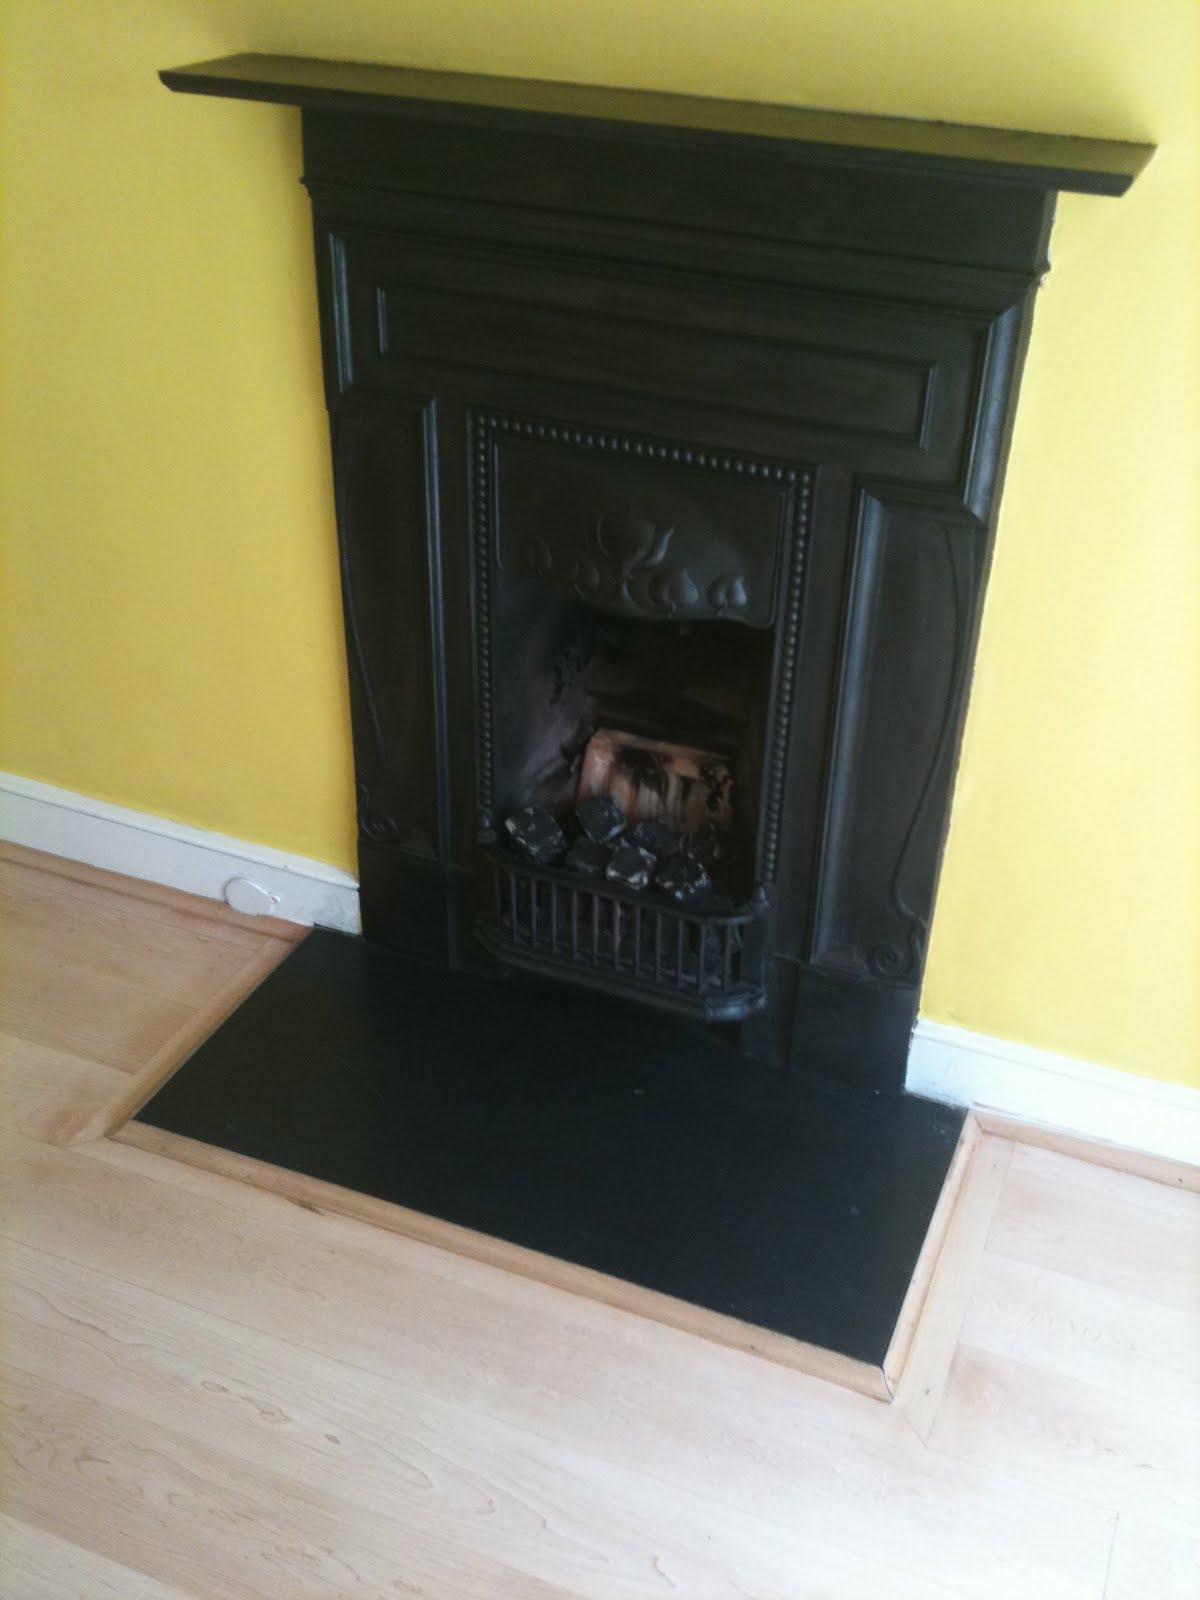 rather innocuous cast iron Art Nouveau chimneypiece was replaced